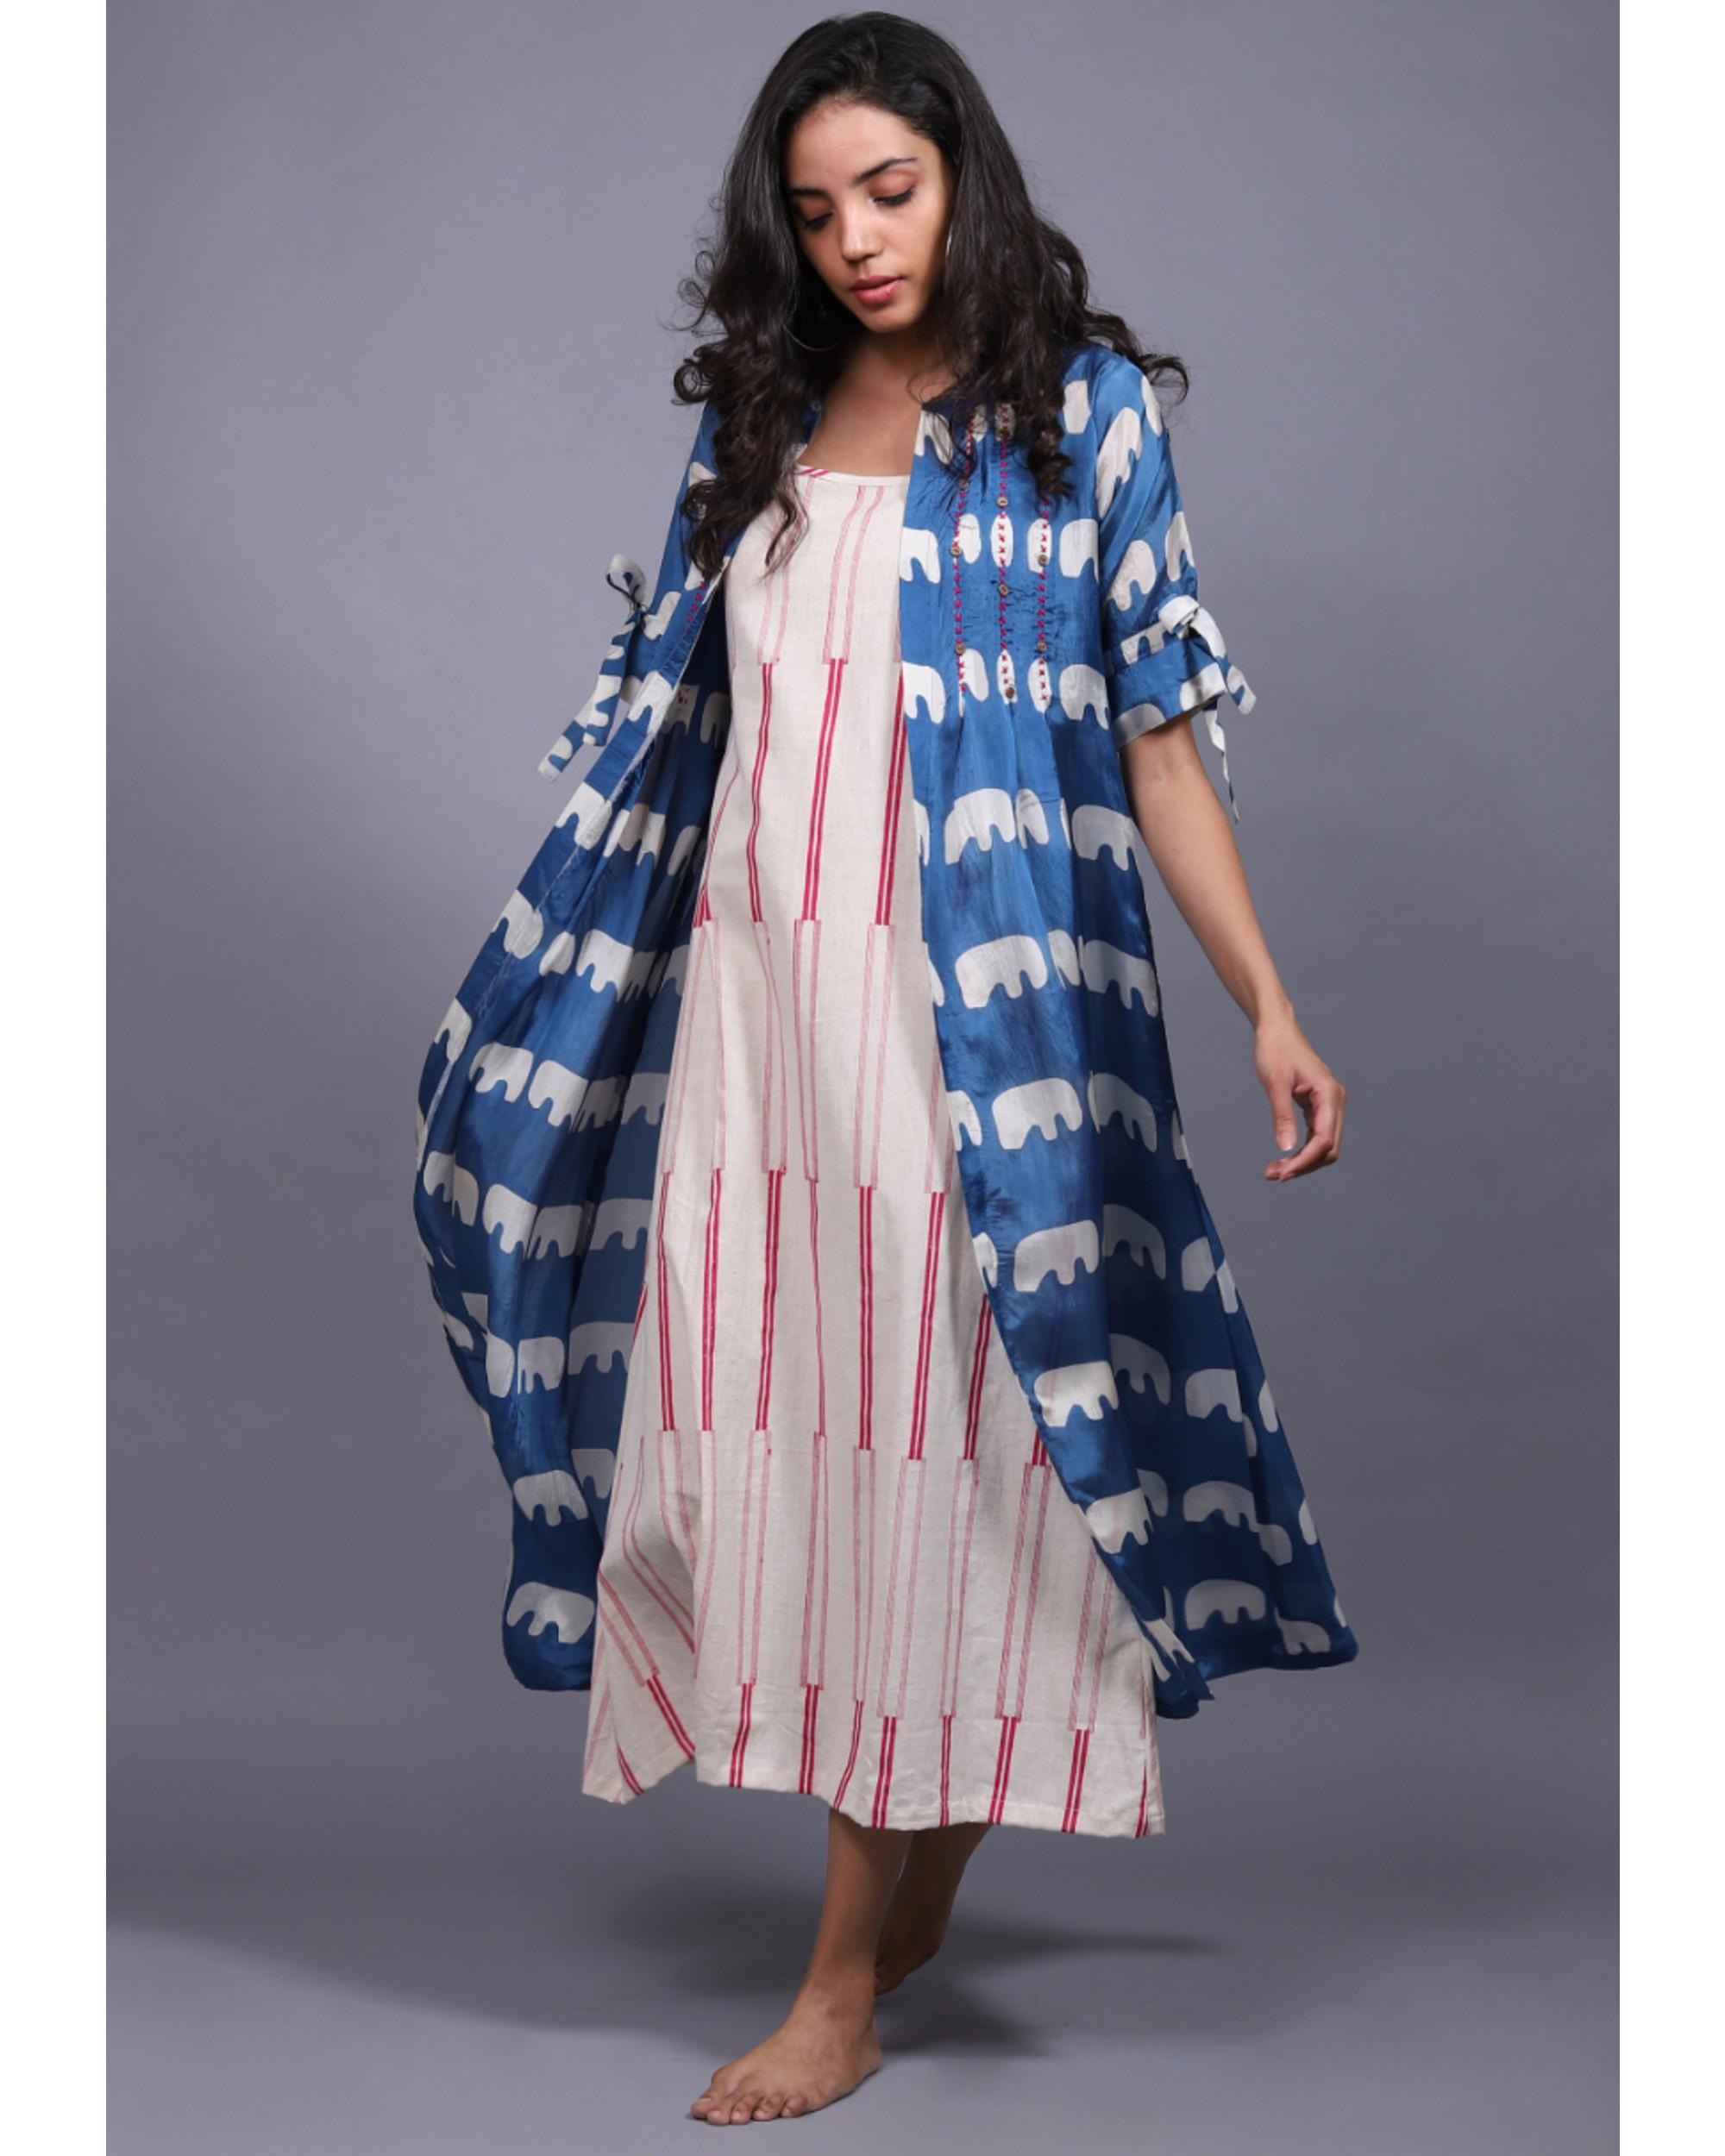 Blue and white printed habutai jacket and printed dress set- Set Of Two